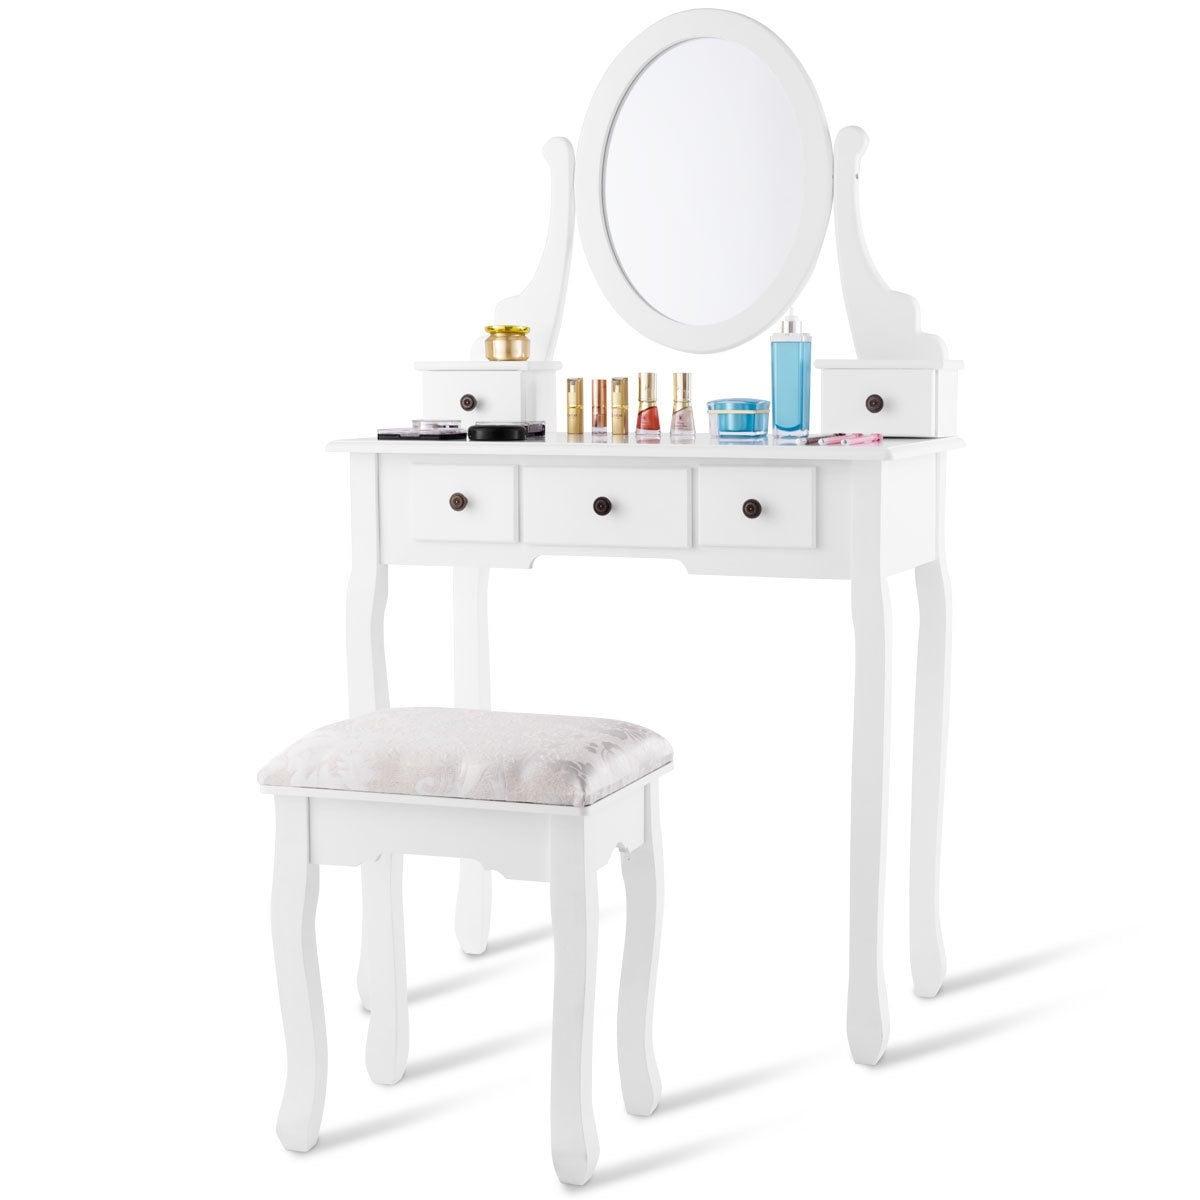 Costway Makeup Desk Vanity Dressing Table Set W/ Oval Mirror Stool 5 Storage Drawers